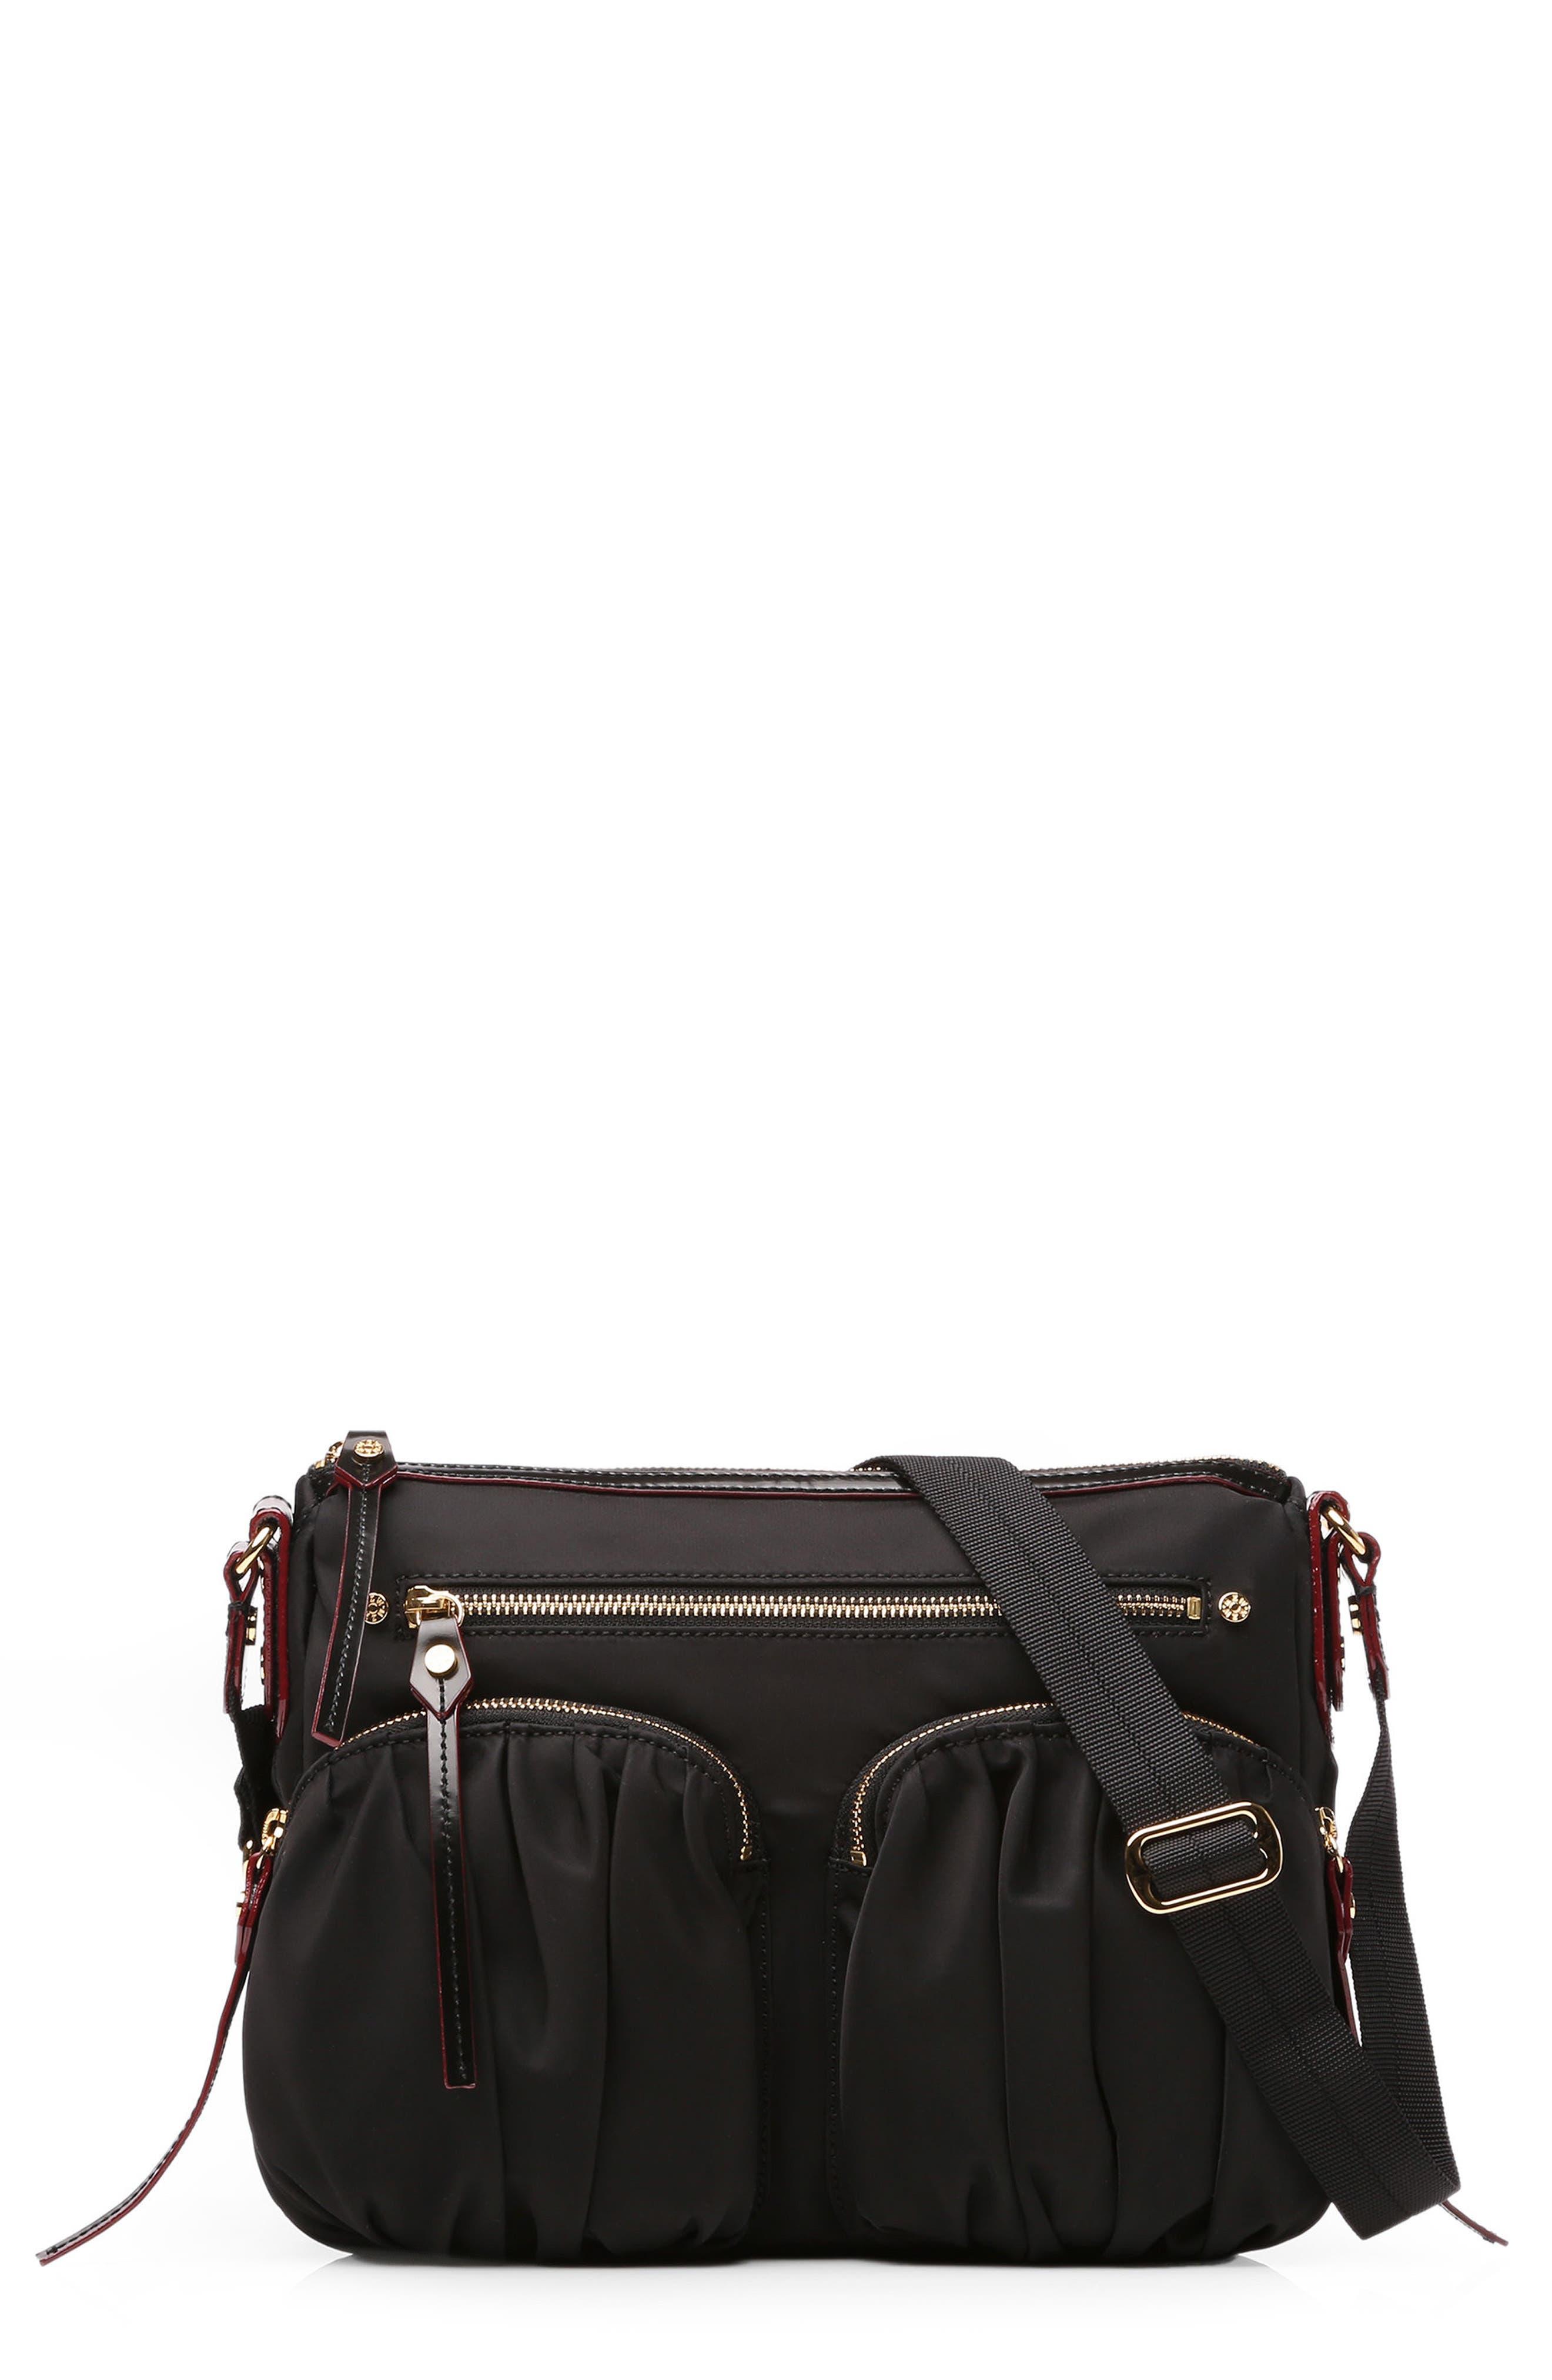 MZ Wallace 'Paige' Bedford Nylon Crossbody Bag